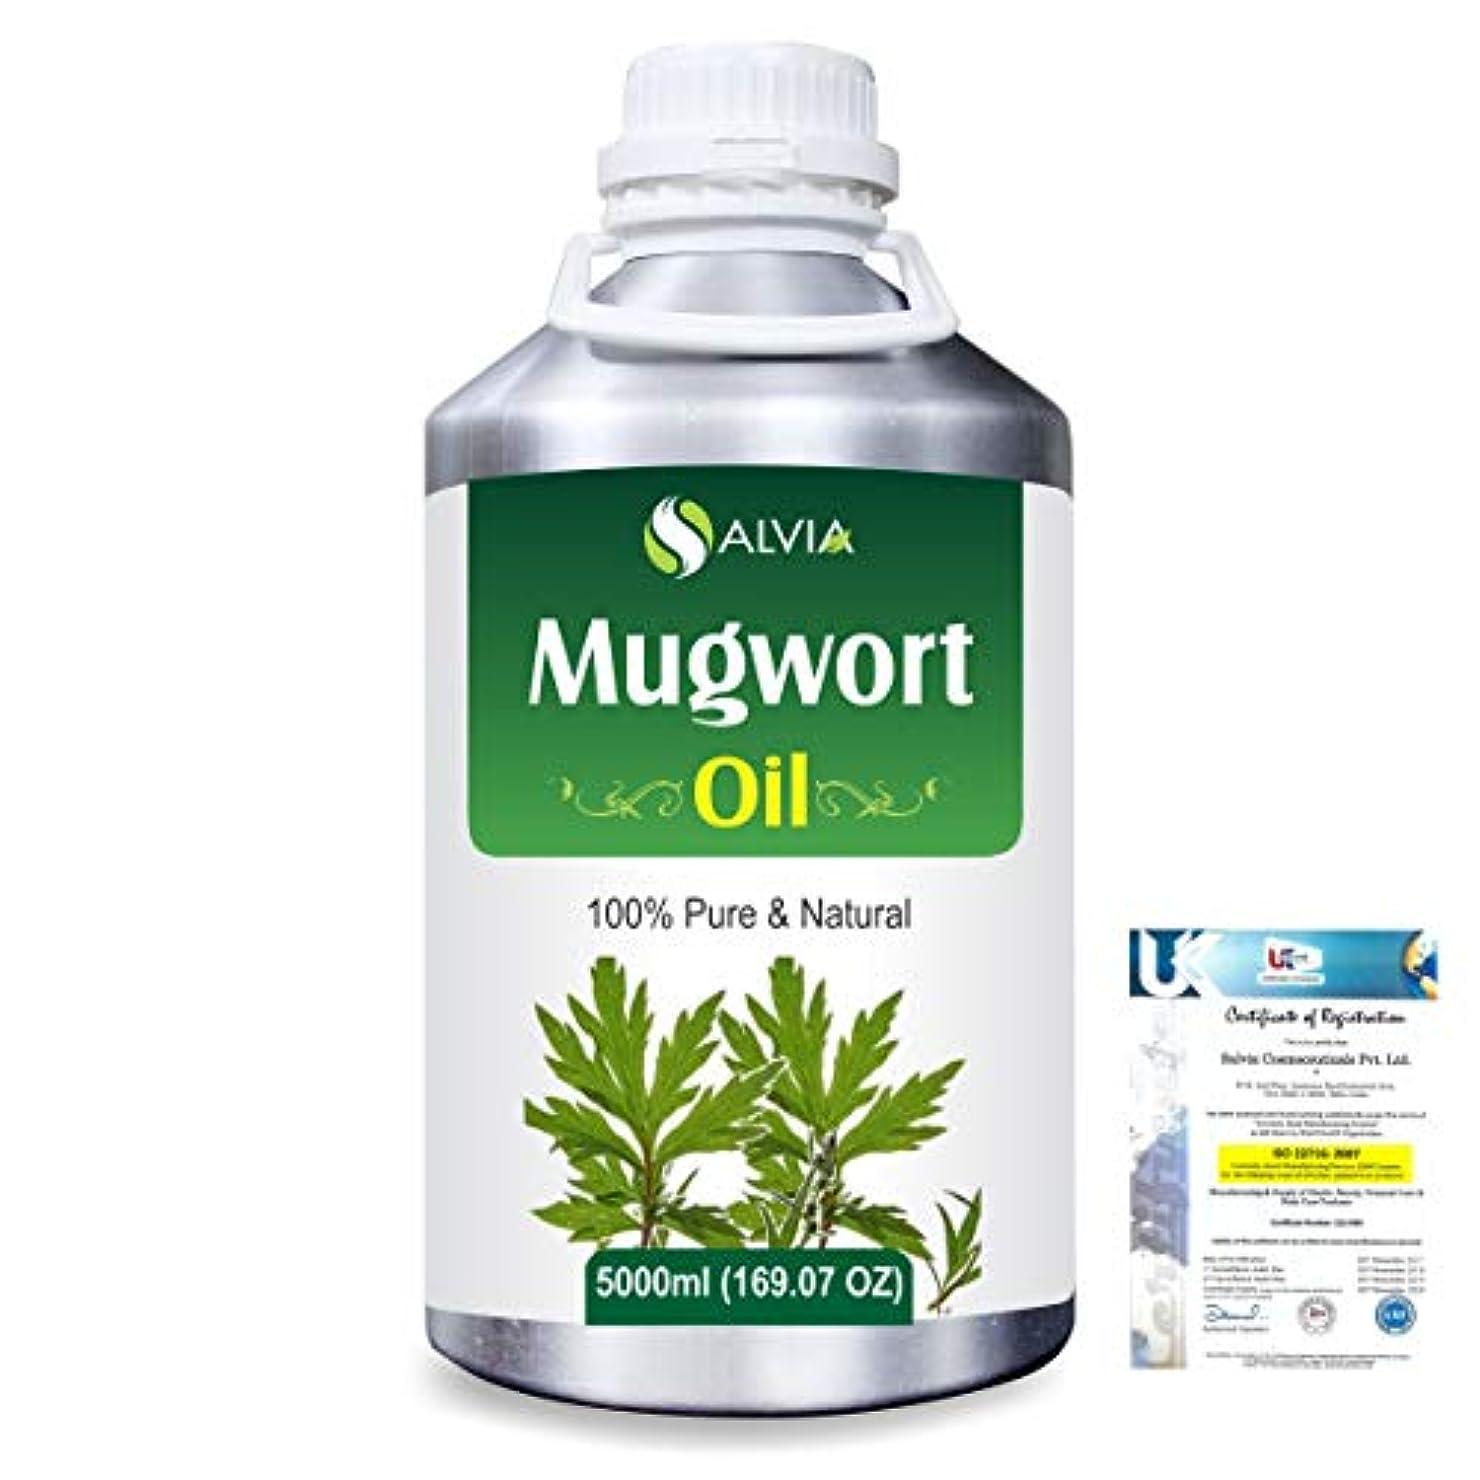 Mugwort (Artemisia vulgaris) 100% Natural Pure Essential Oil 5000ml/169fl.oz.